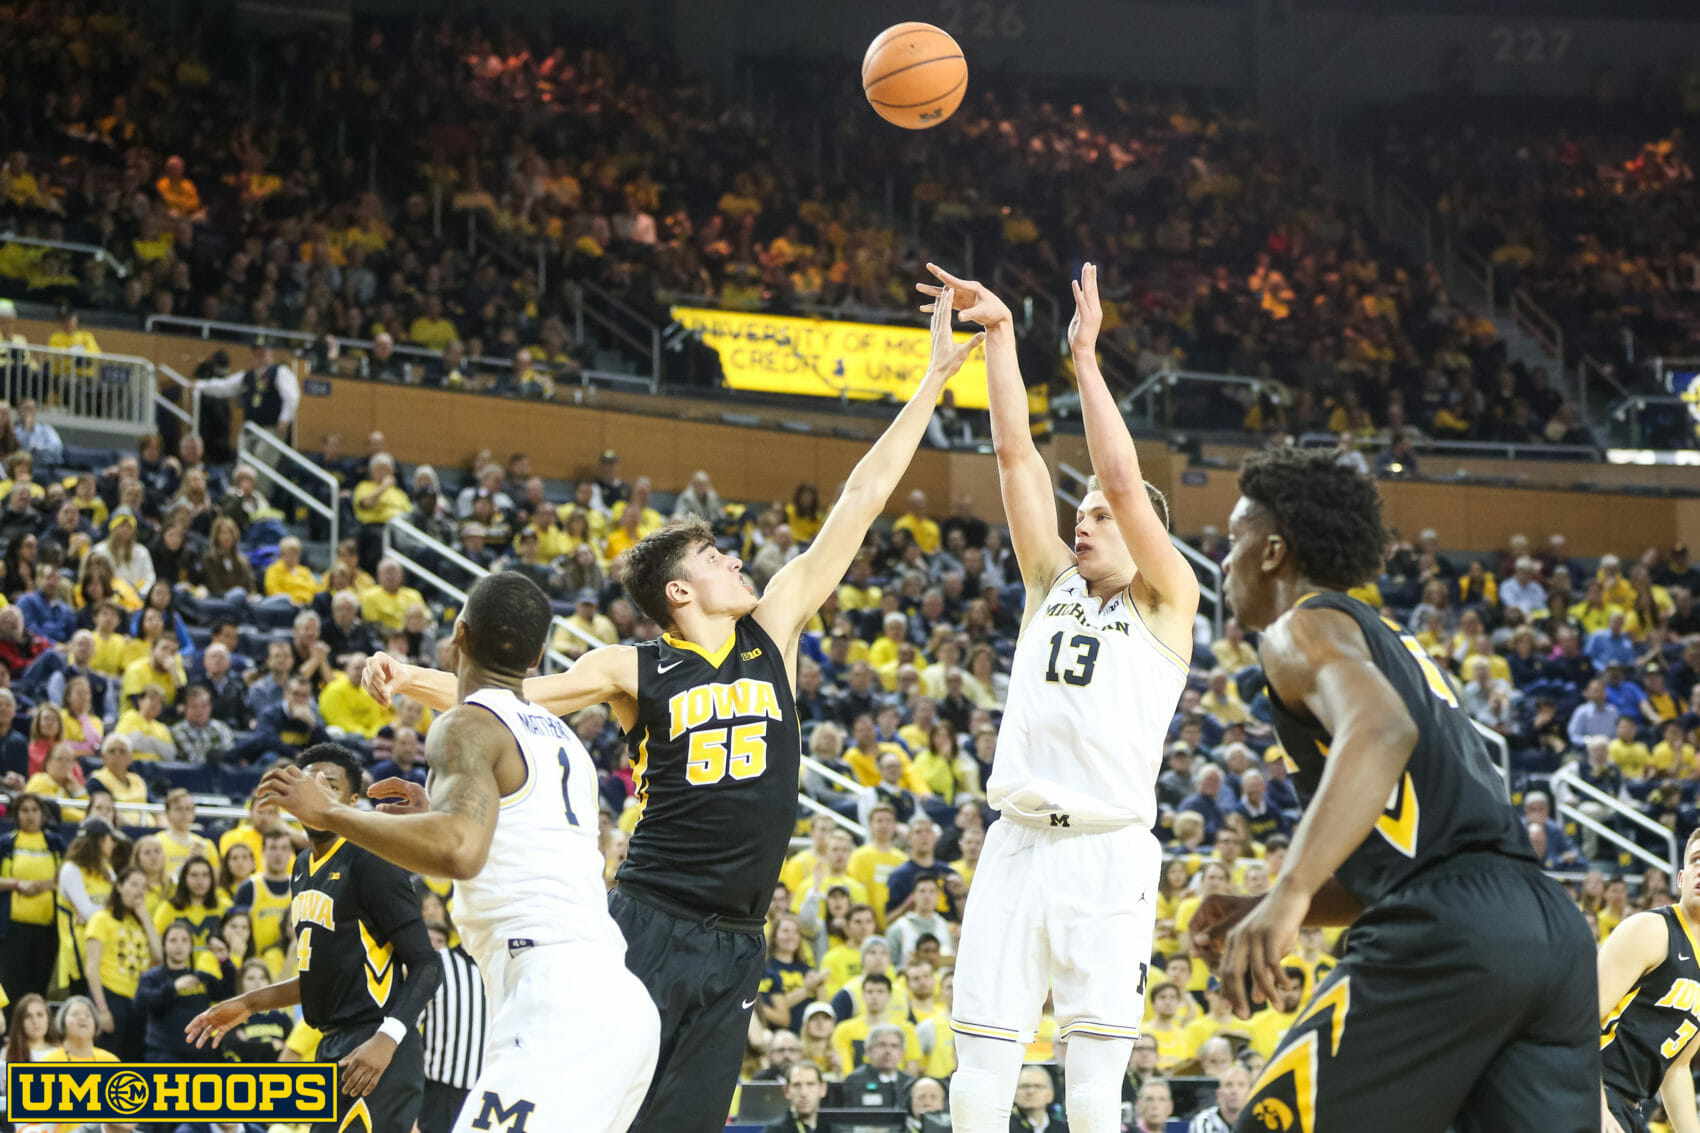 Michigan 74, Iowa 59-16